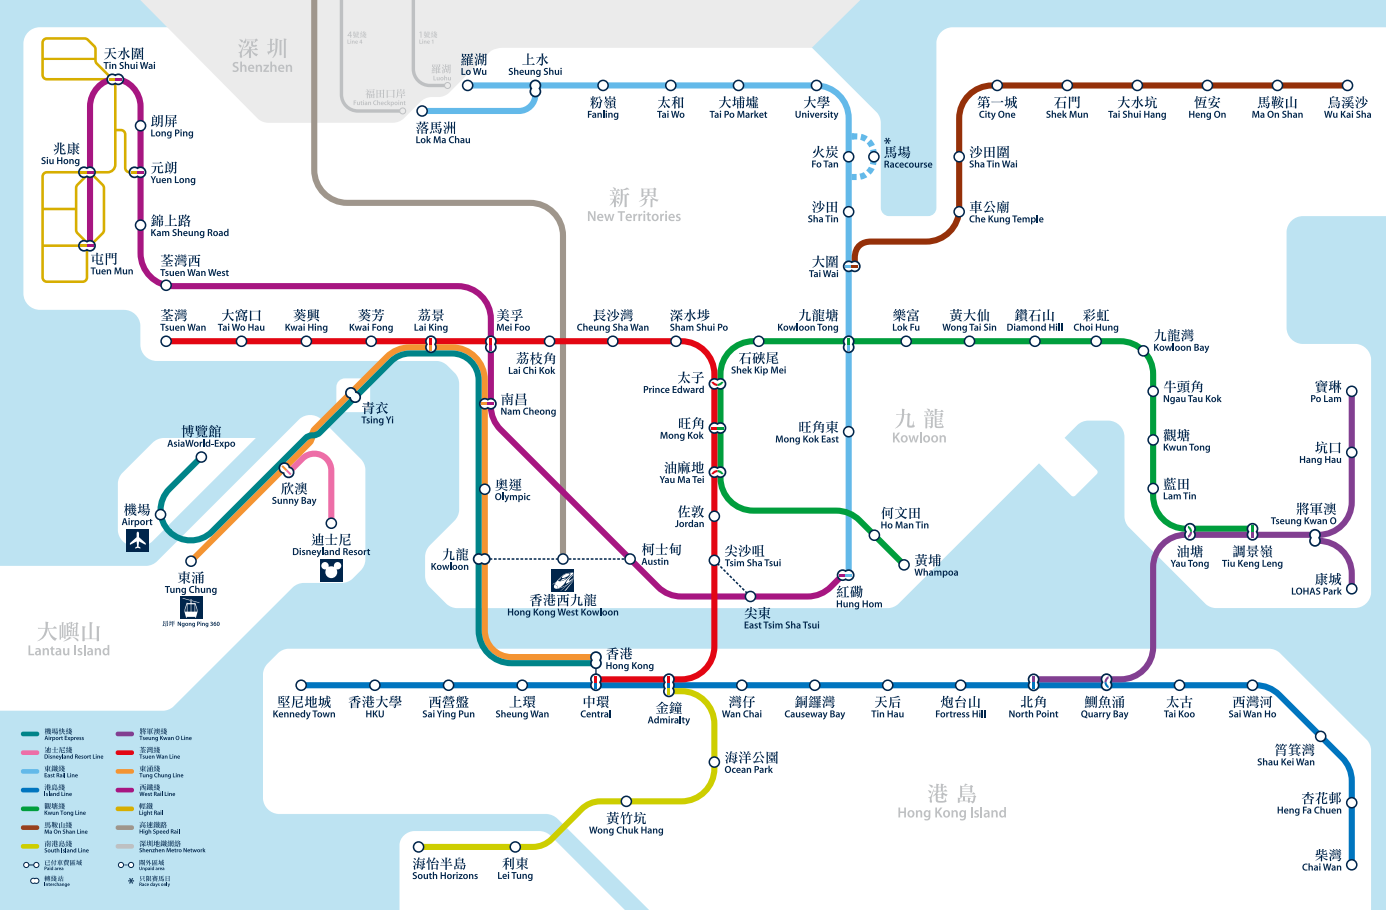 https://www.chinadiscovery.com/assets/images/hongkong/transportation/mtr/hongkong-mtr-map.jpg